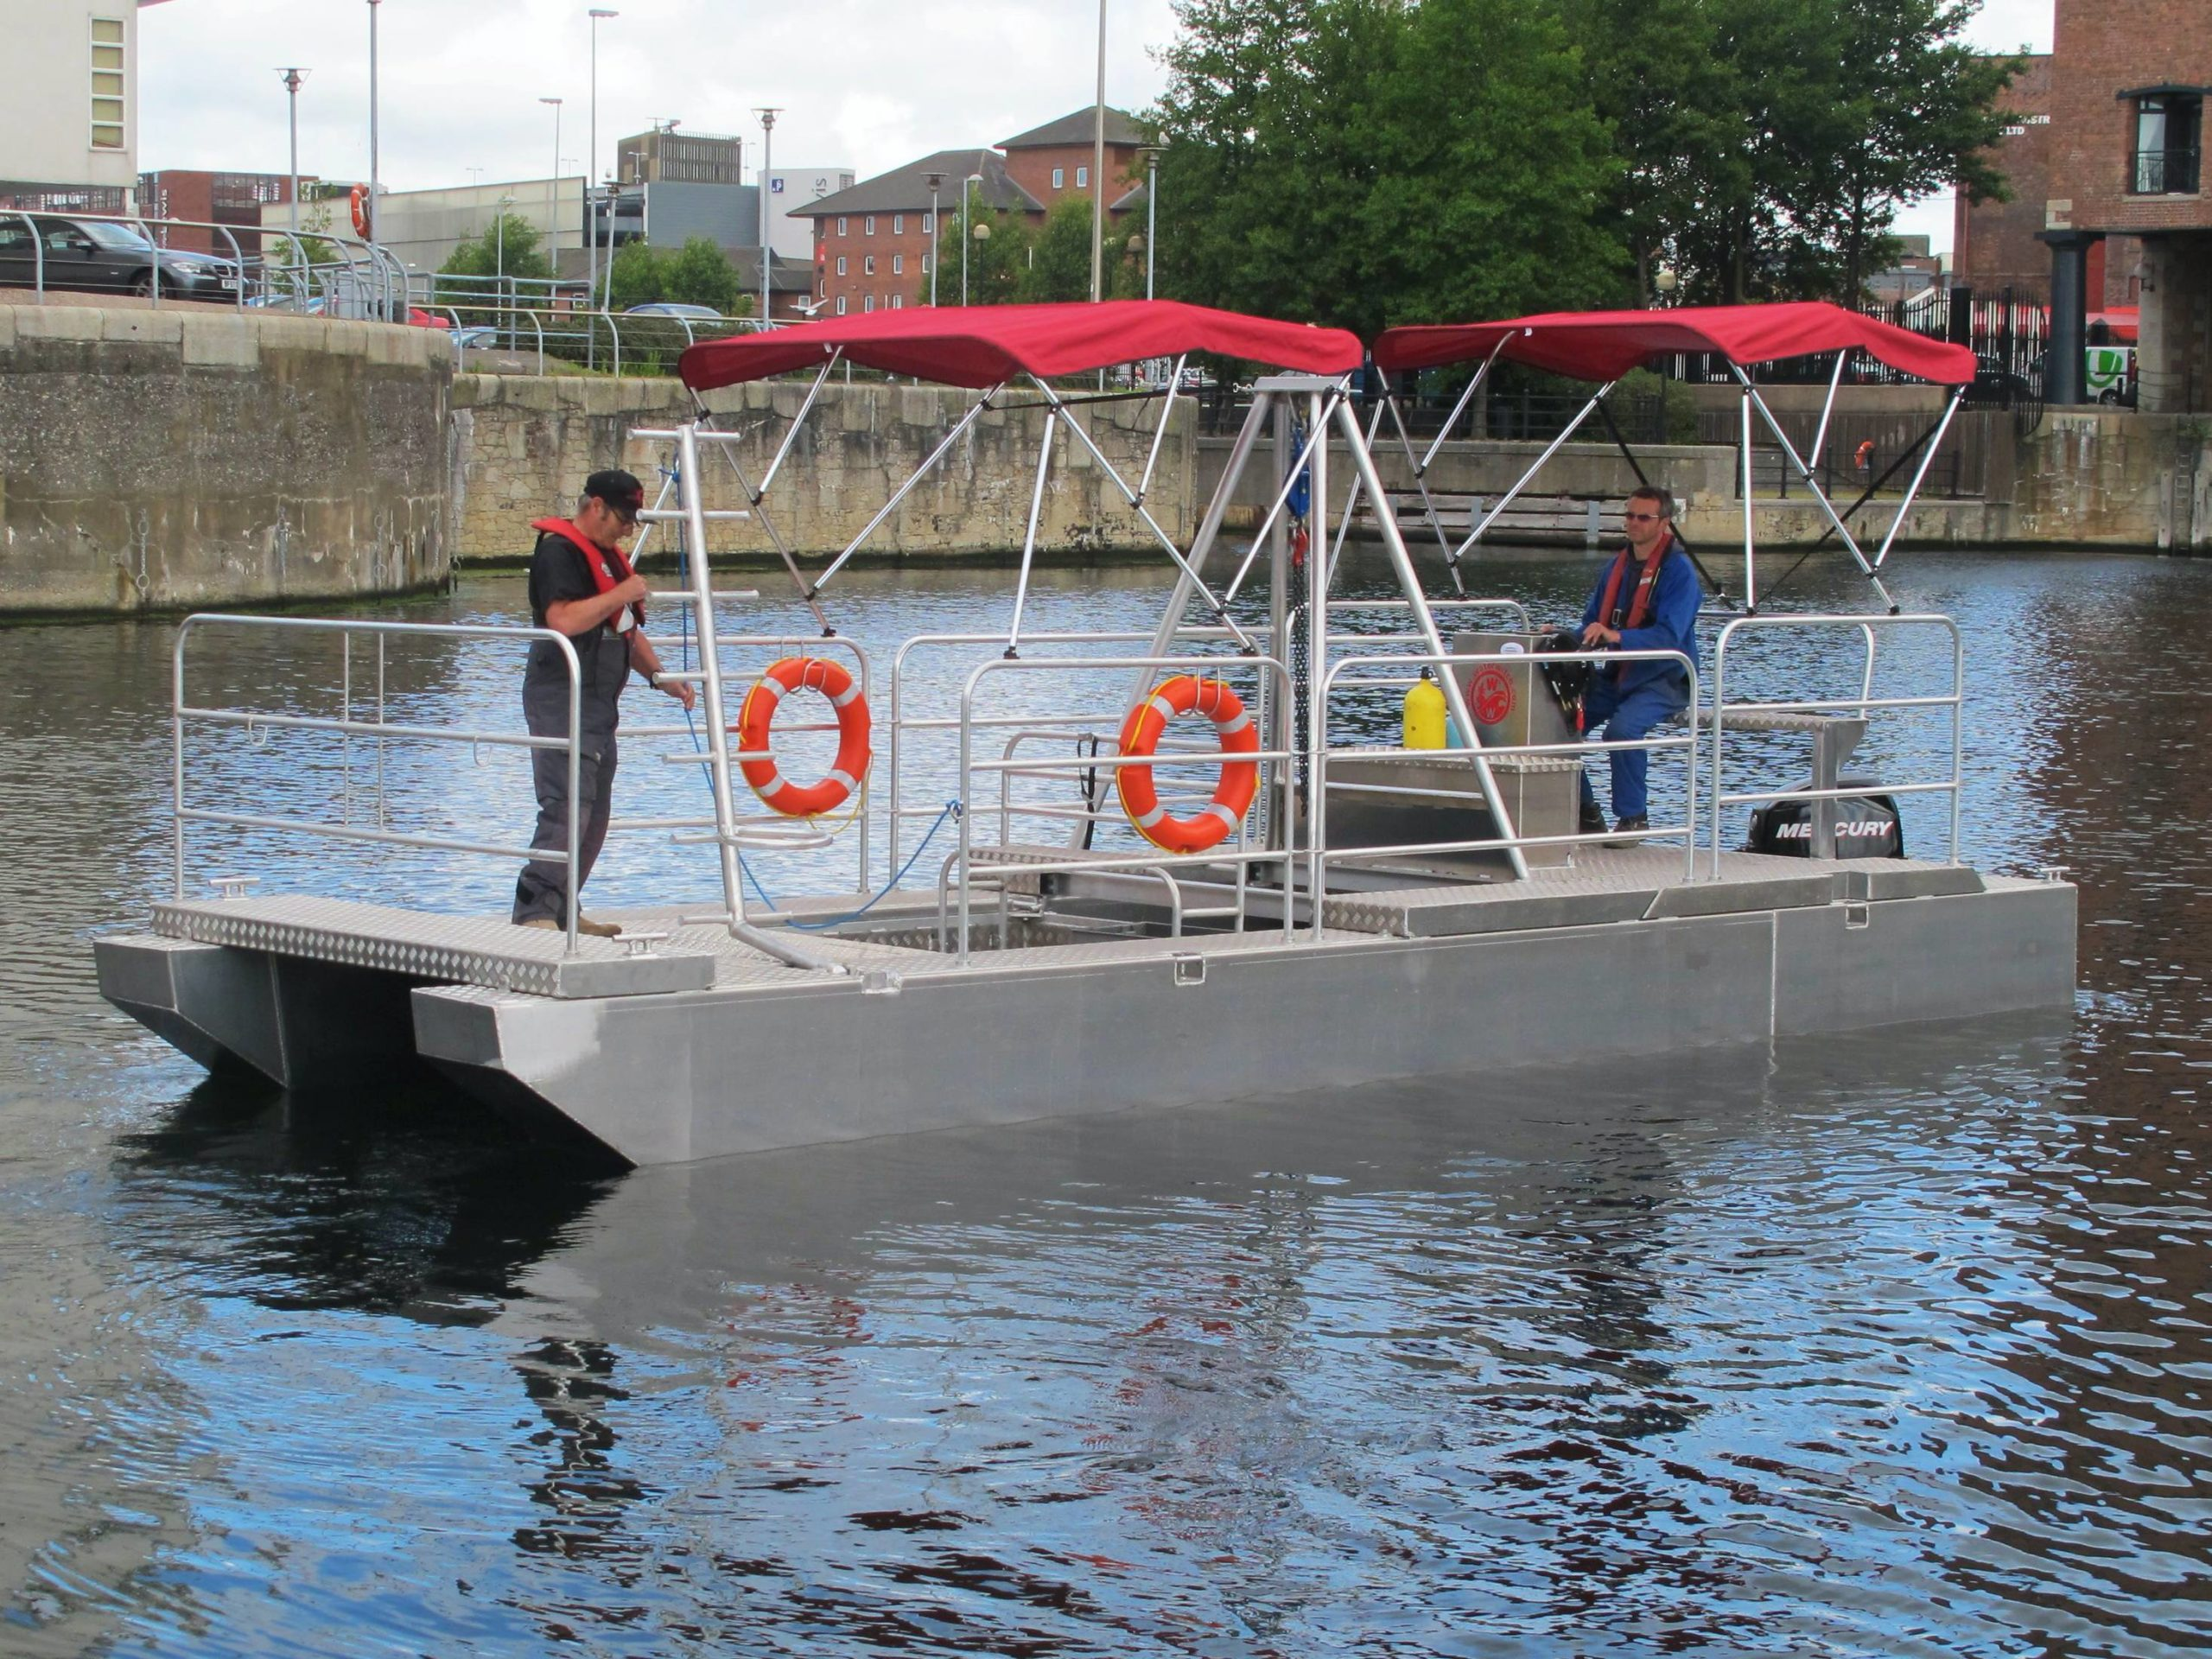 Scuba diving platform boat